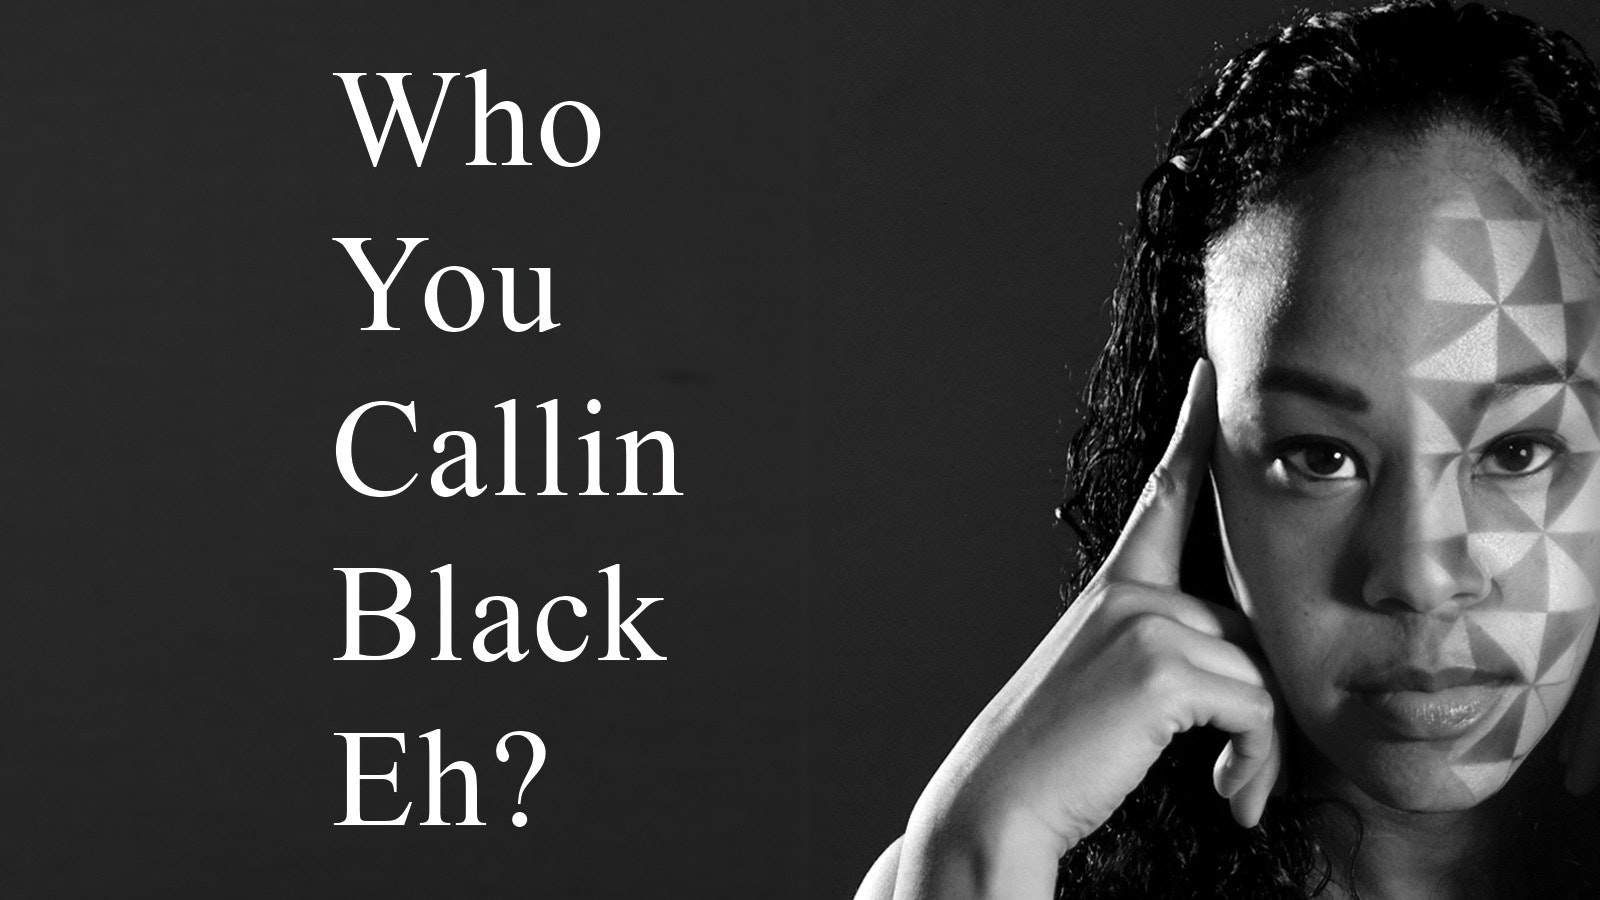 Who You Callin Black Eh?